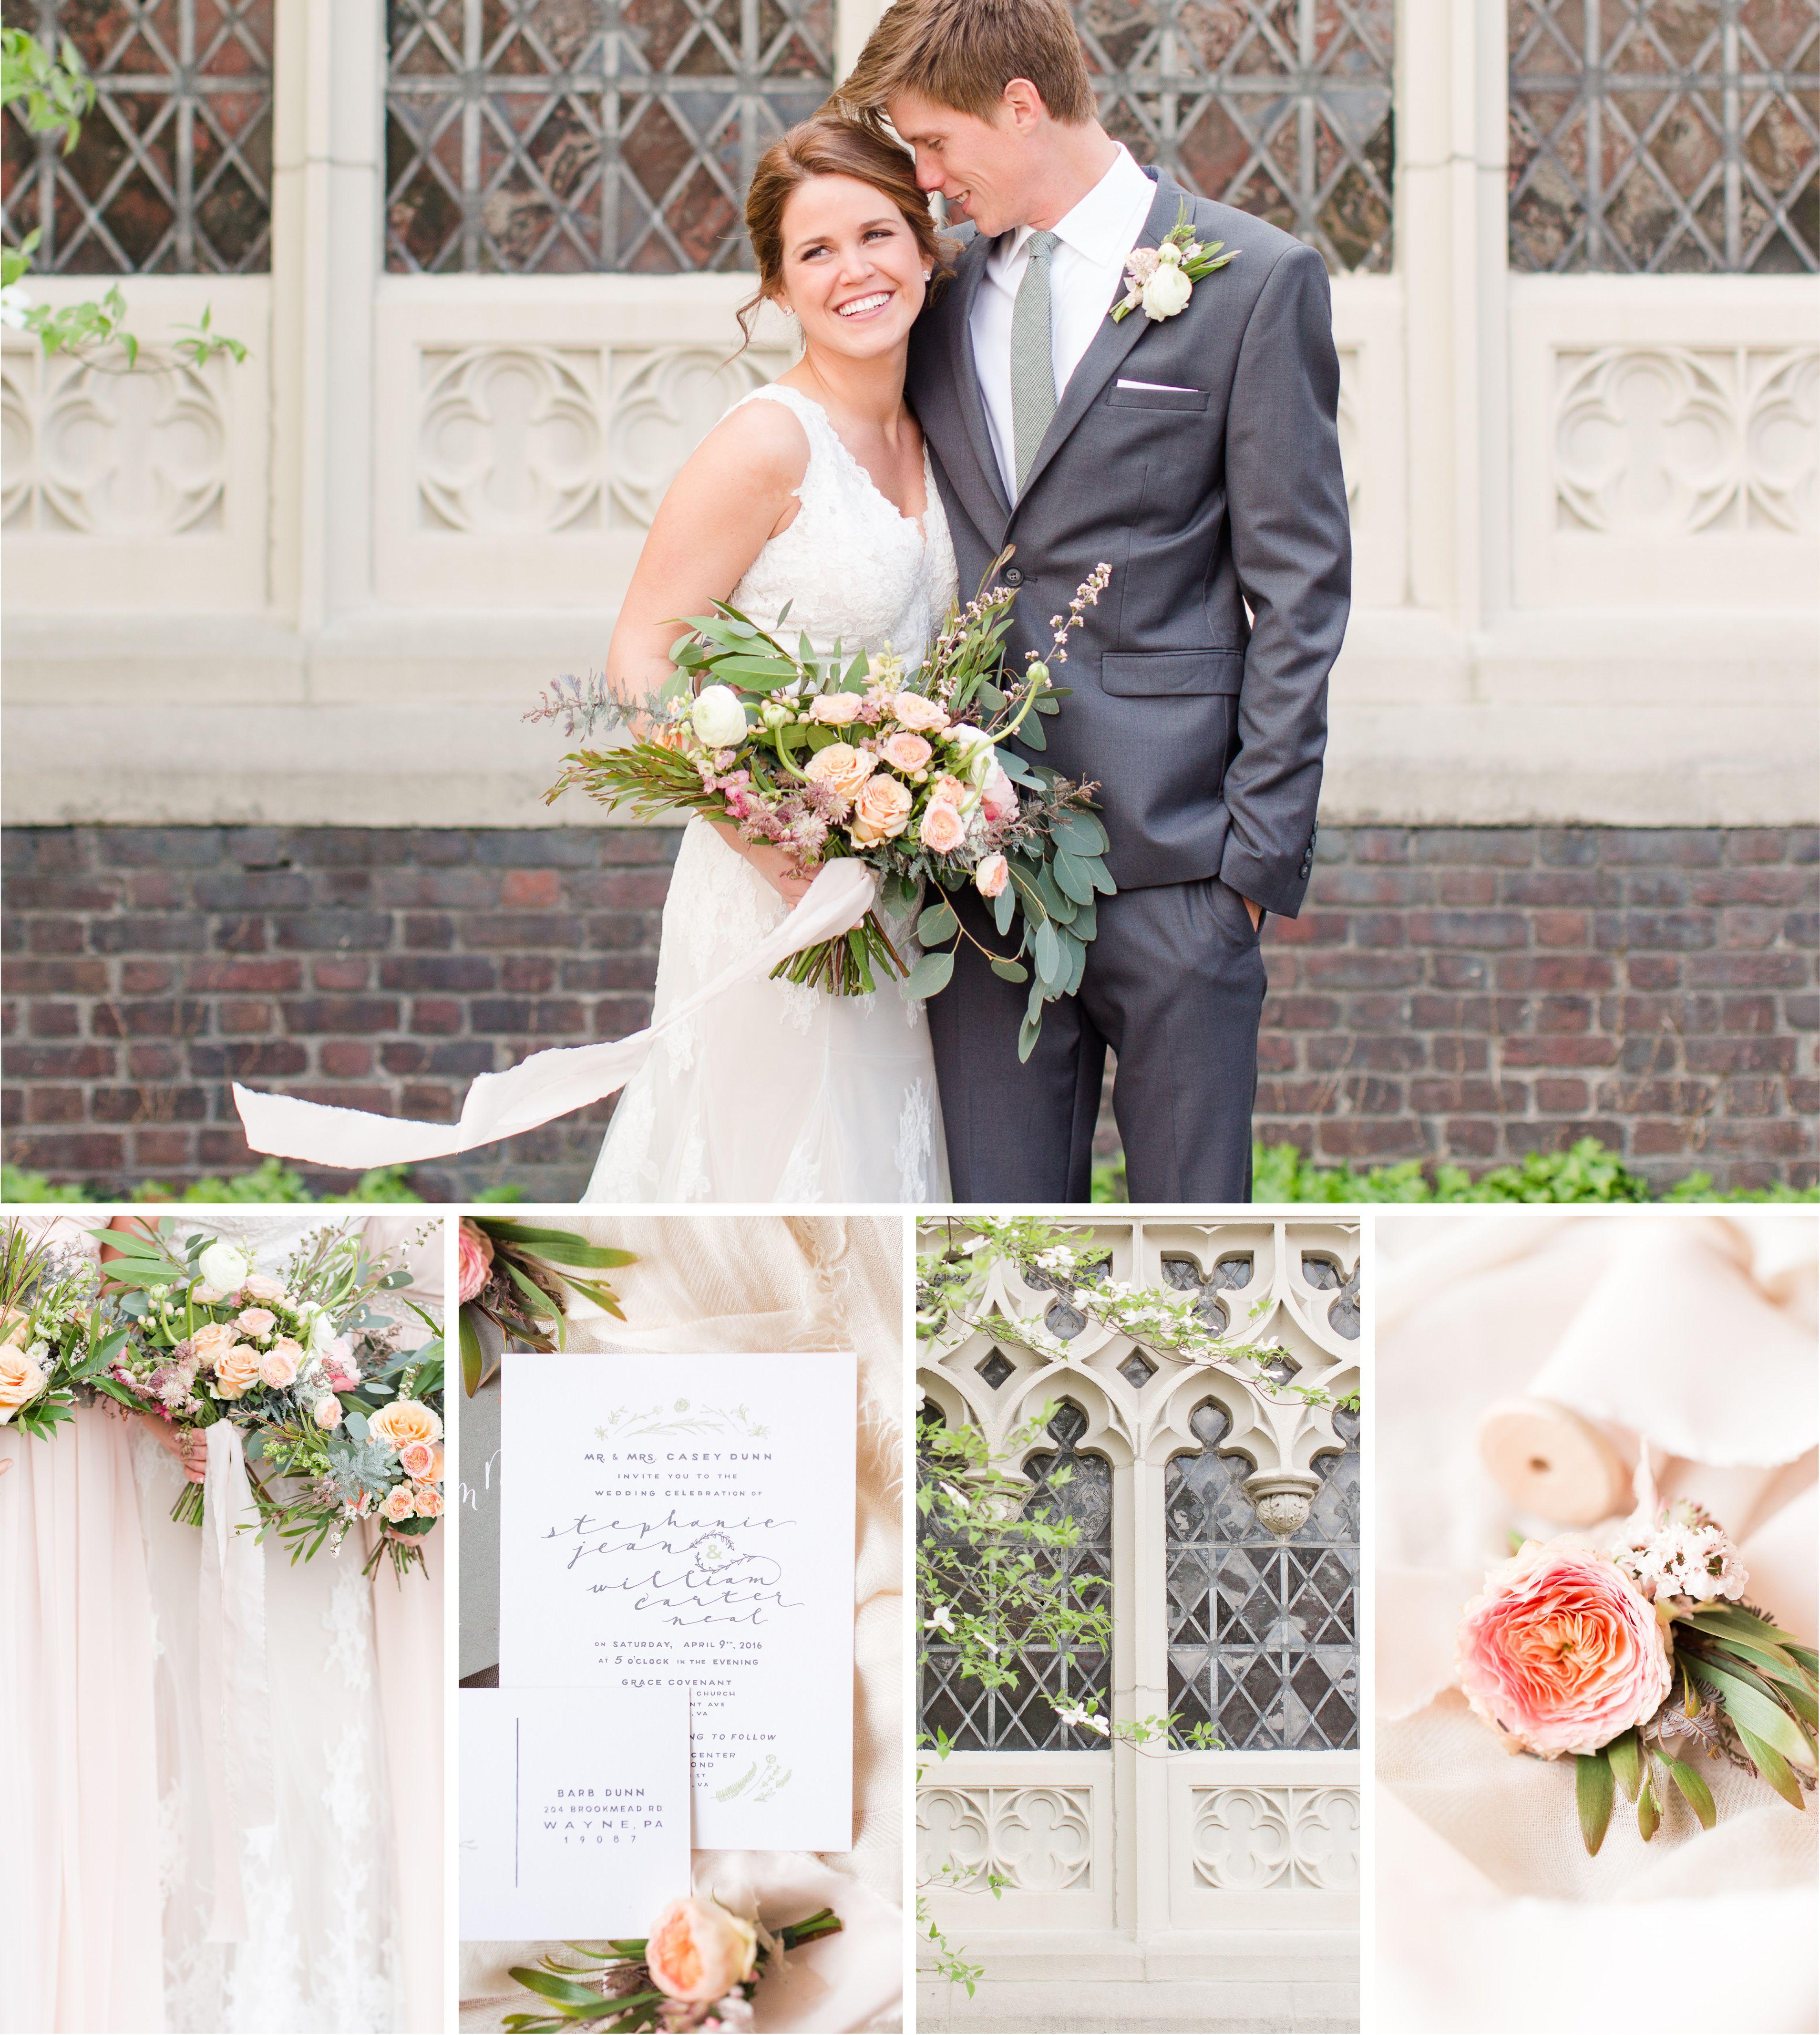 Carter + Steph | A Classic Richmond Wedding | Virginia ...